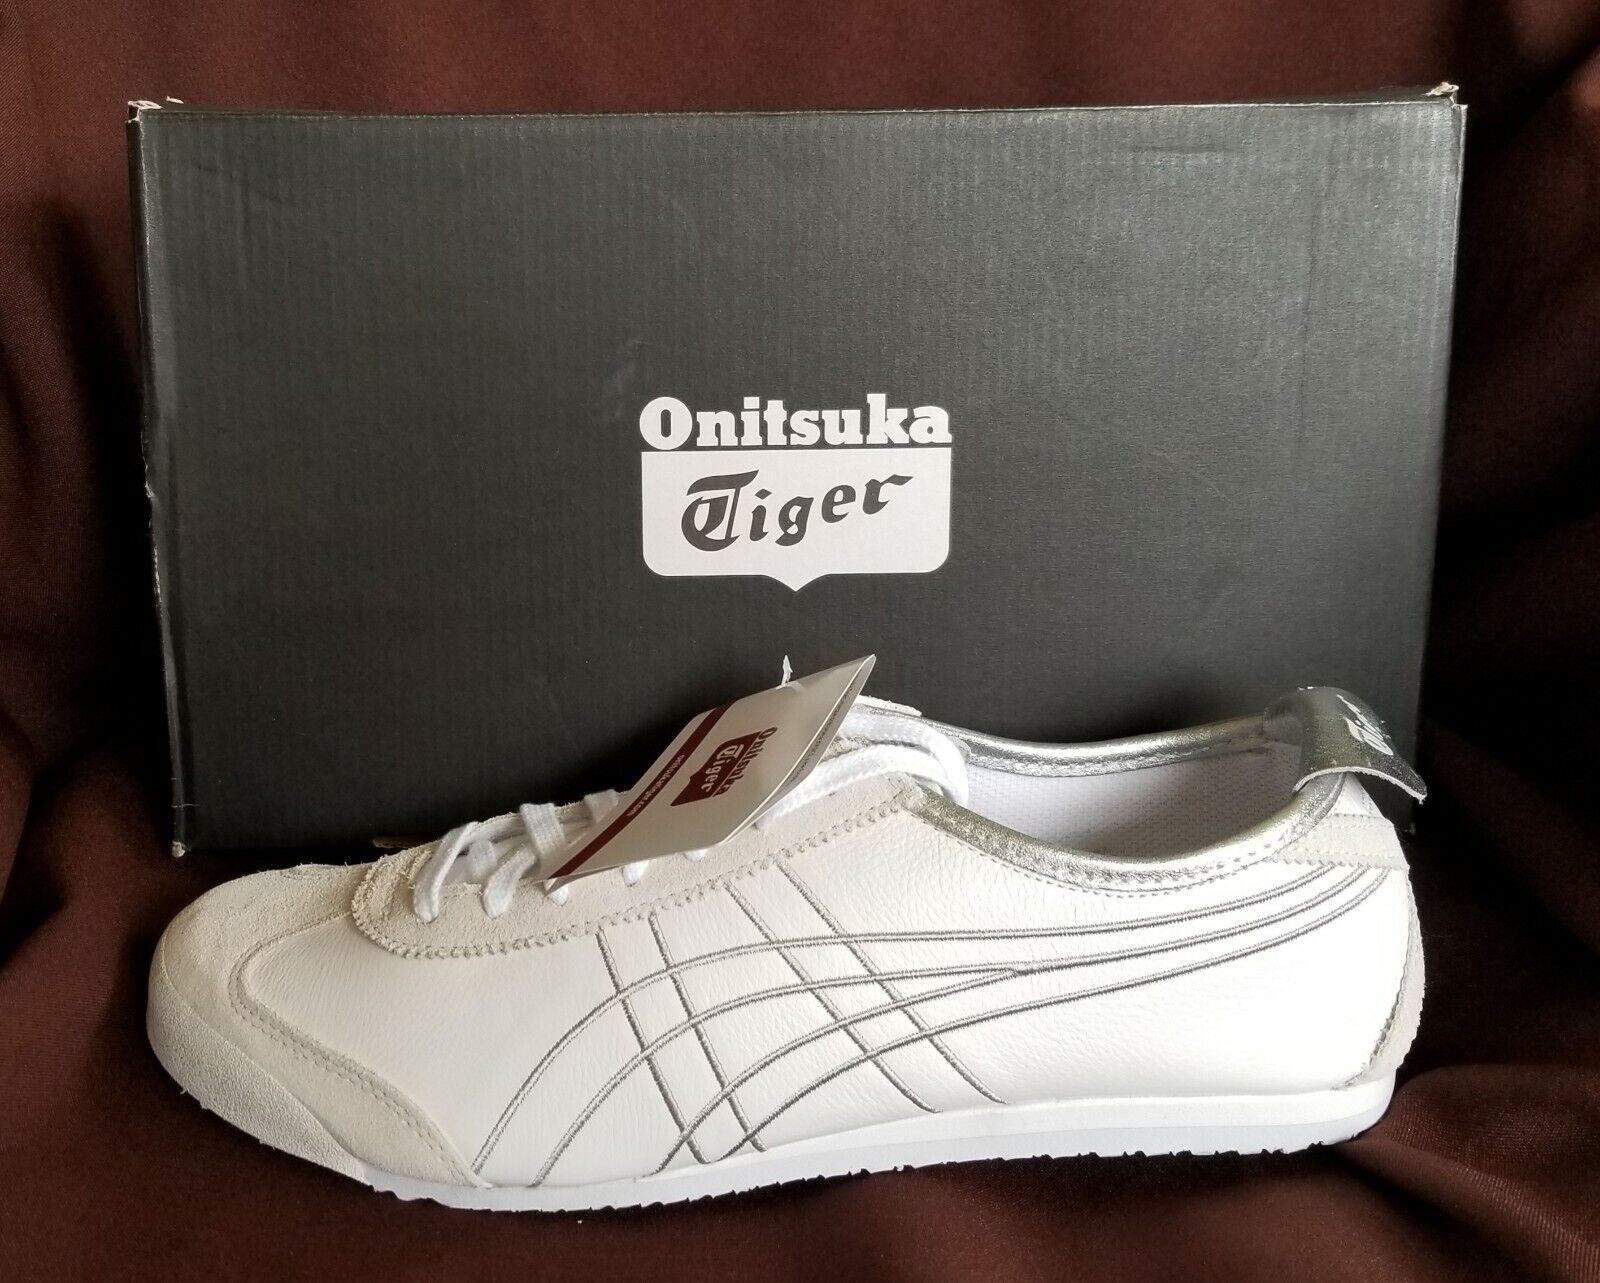 Asics Onitsuka Tiger Mexico 66 blancoo Plata Retro Zapatos  2 o 11 Unisex